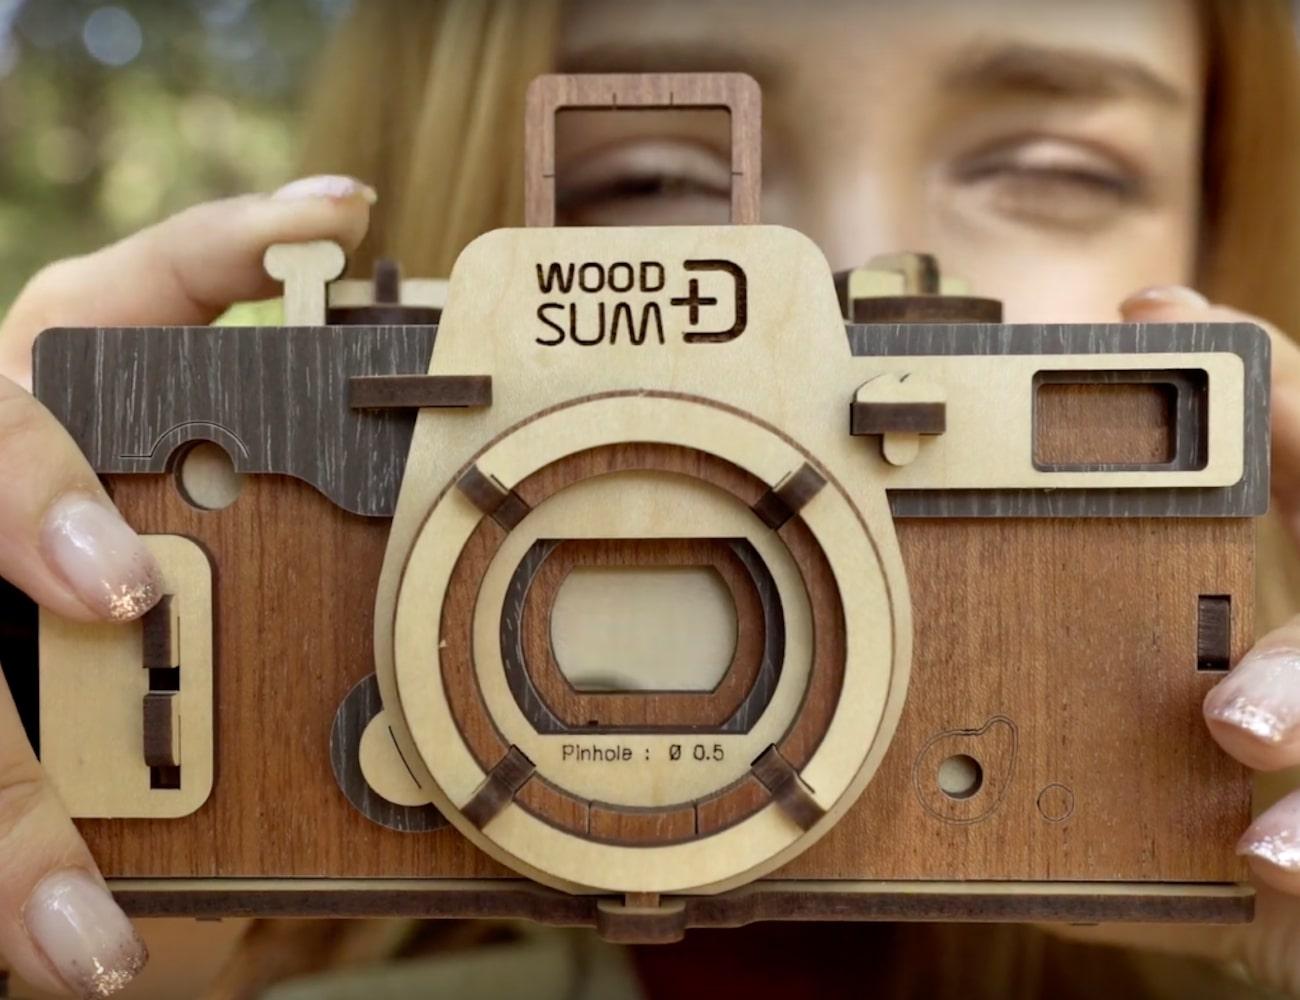 Woodsum DIY Wooden Assembly Pinhole Camera